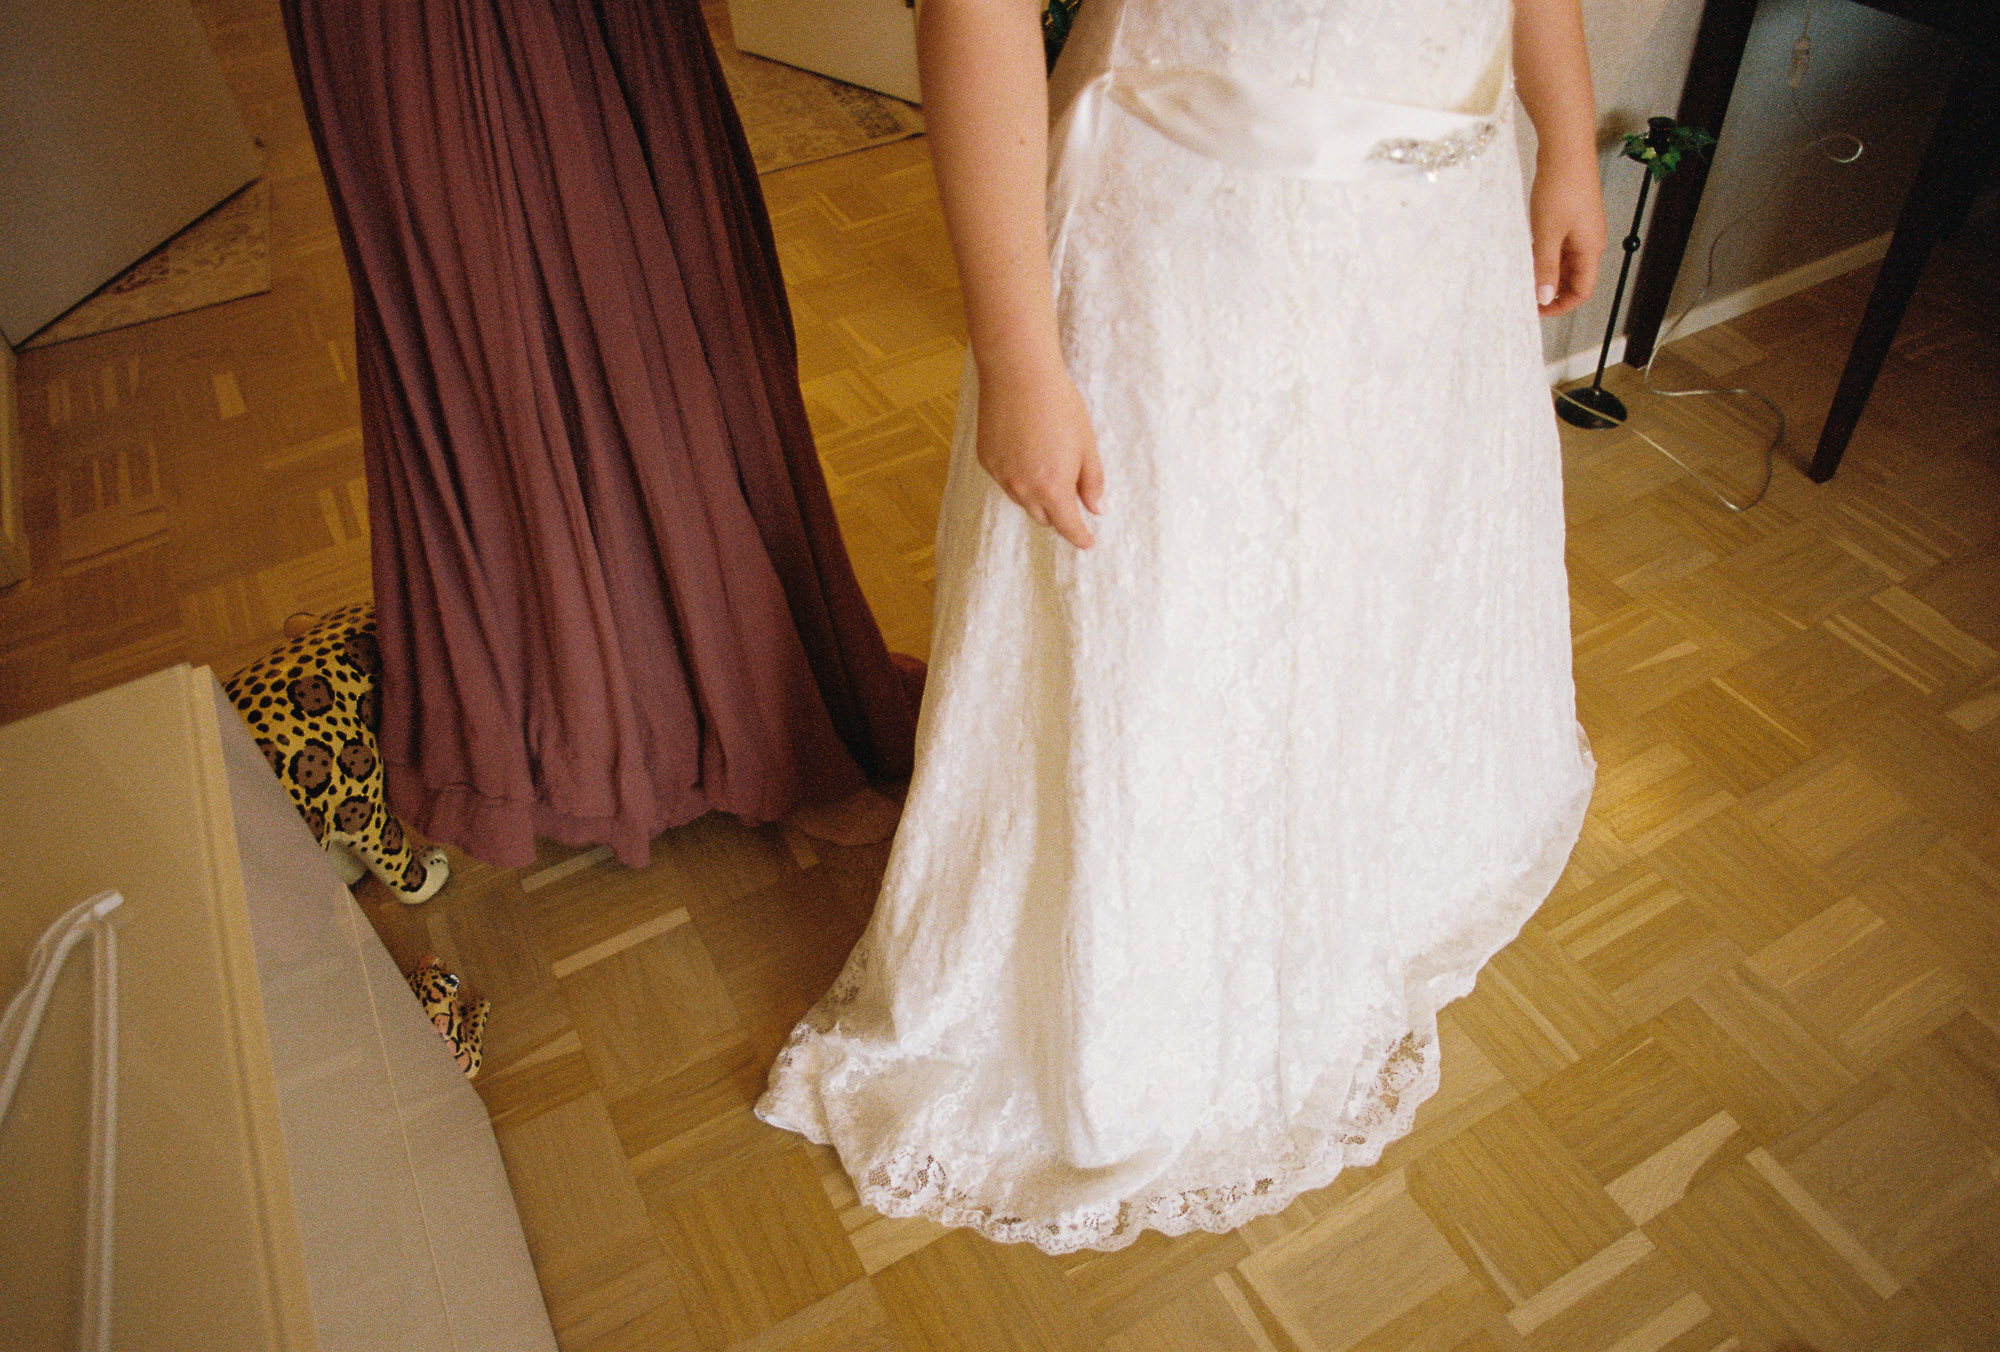 jere-satamo-analog-film-wedding-photographer-finland-016.jpg